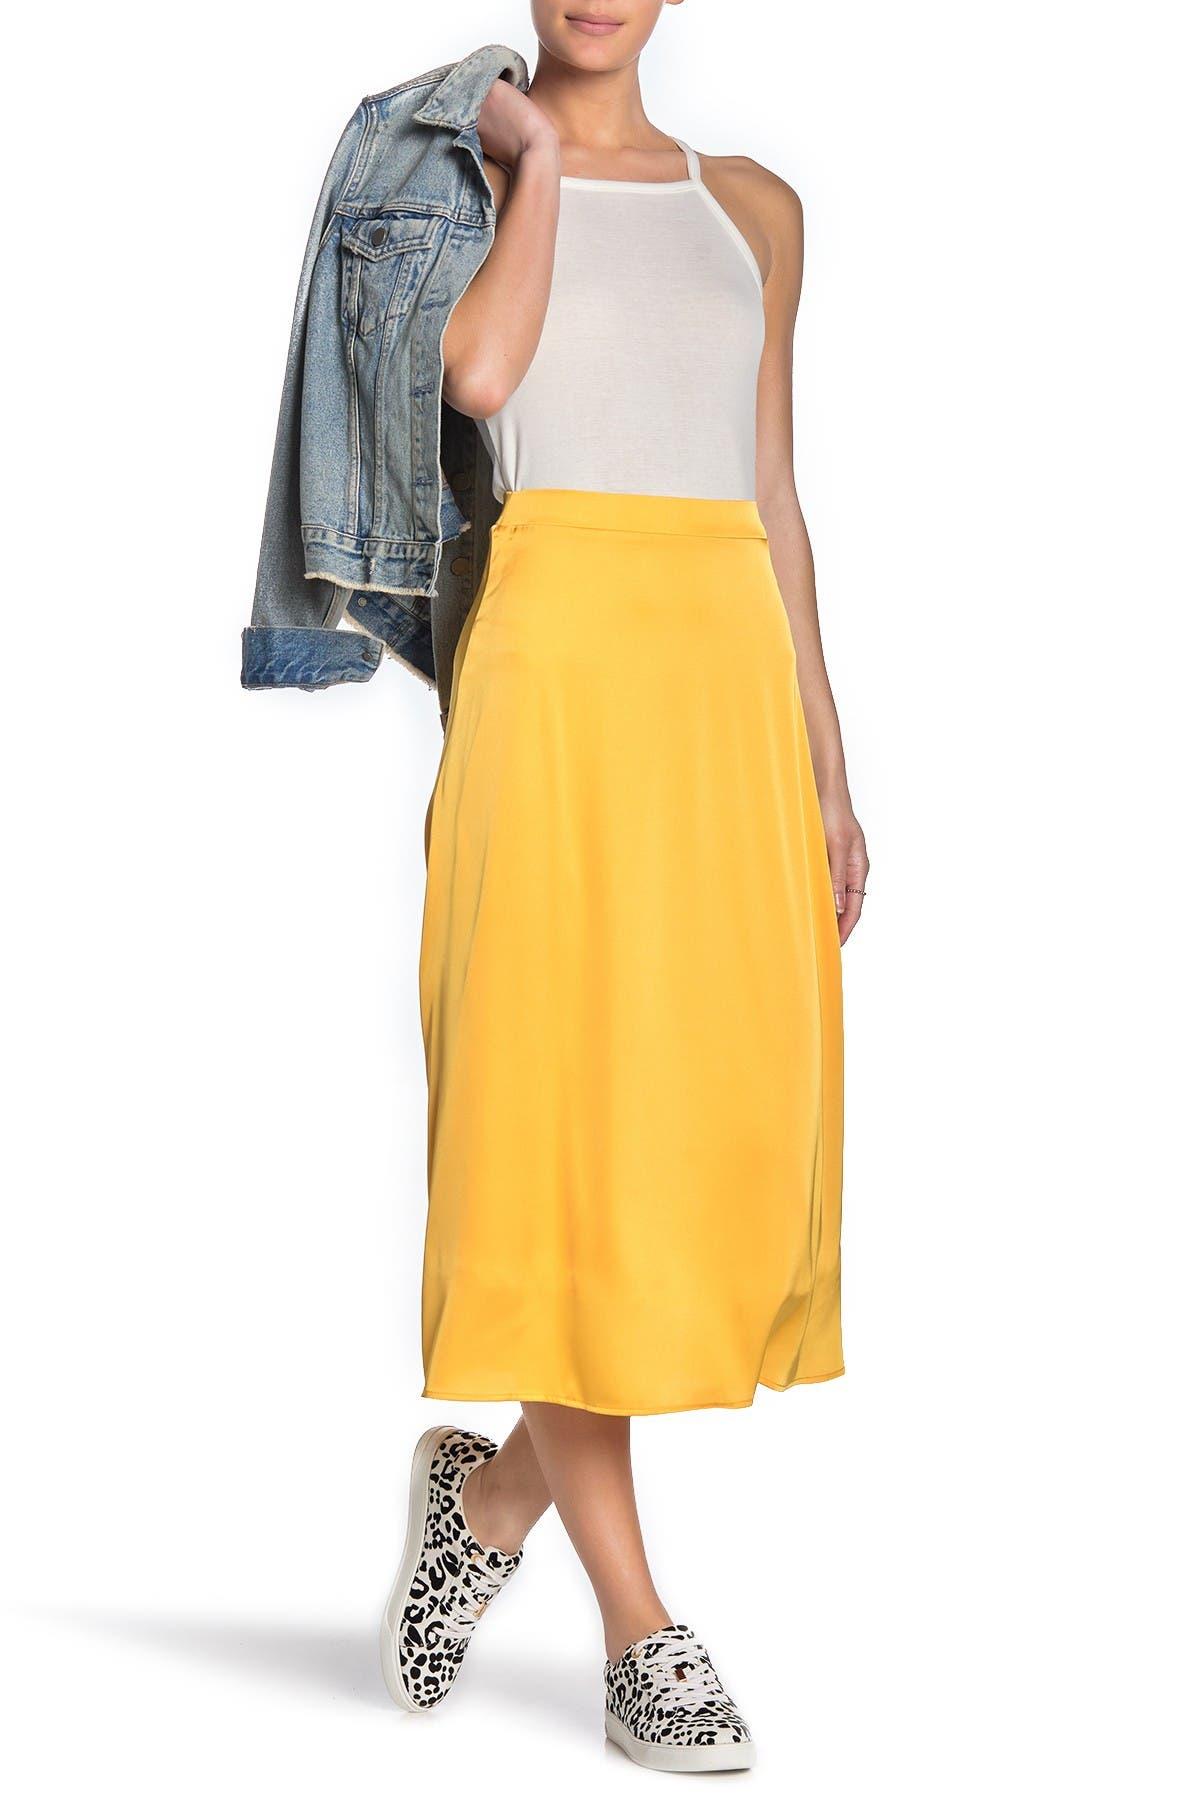 Image of Double Zero Satin Midi Skirt